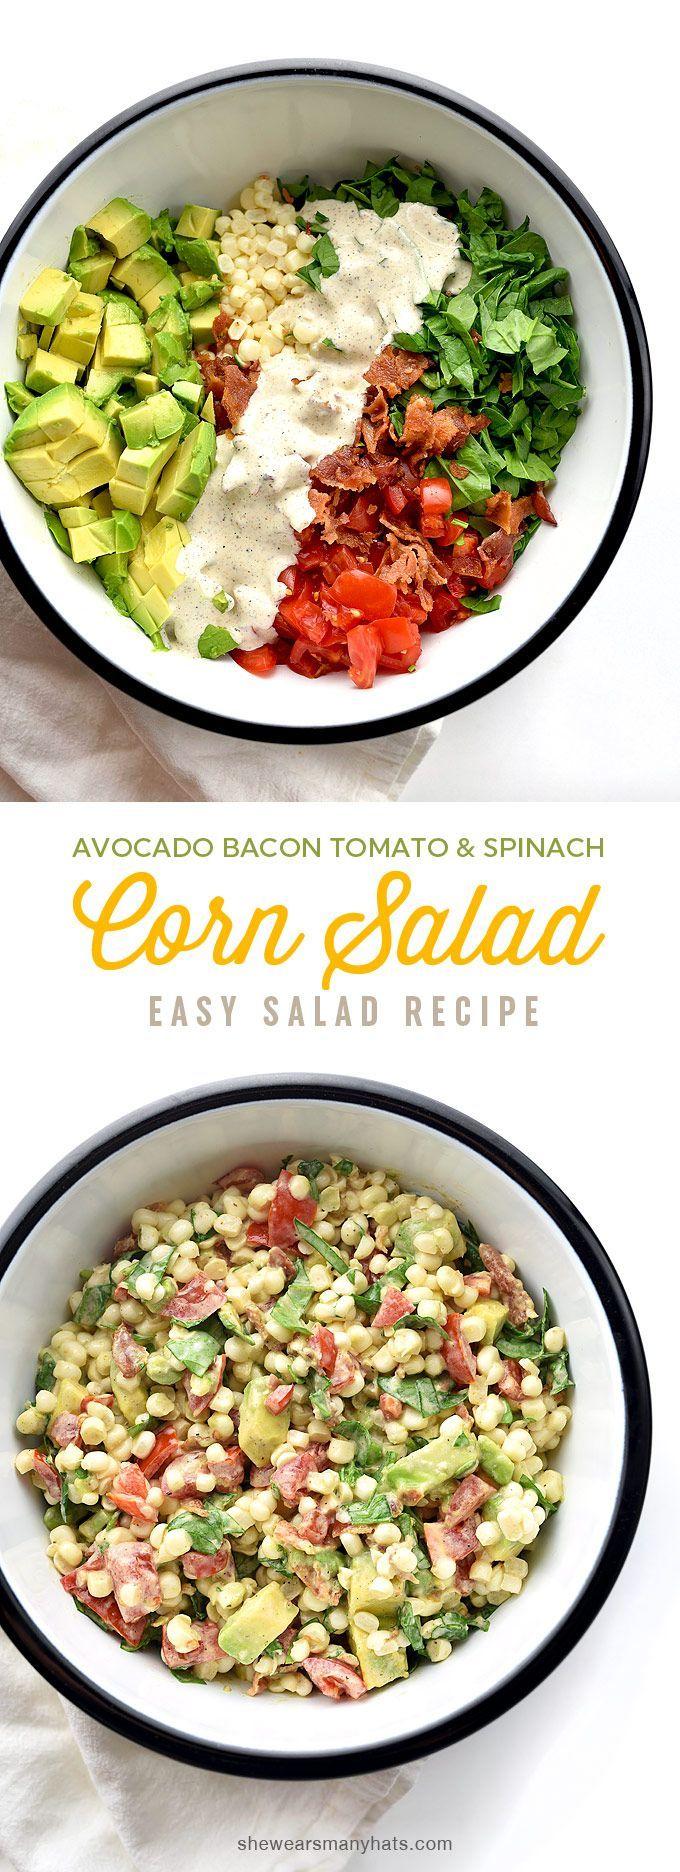 EASY! Avocado Bacon Tomato Spinach Corn Salad Recipe | shewearsmanyhats.com